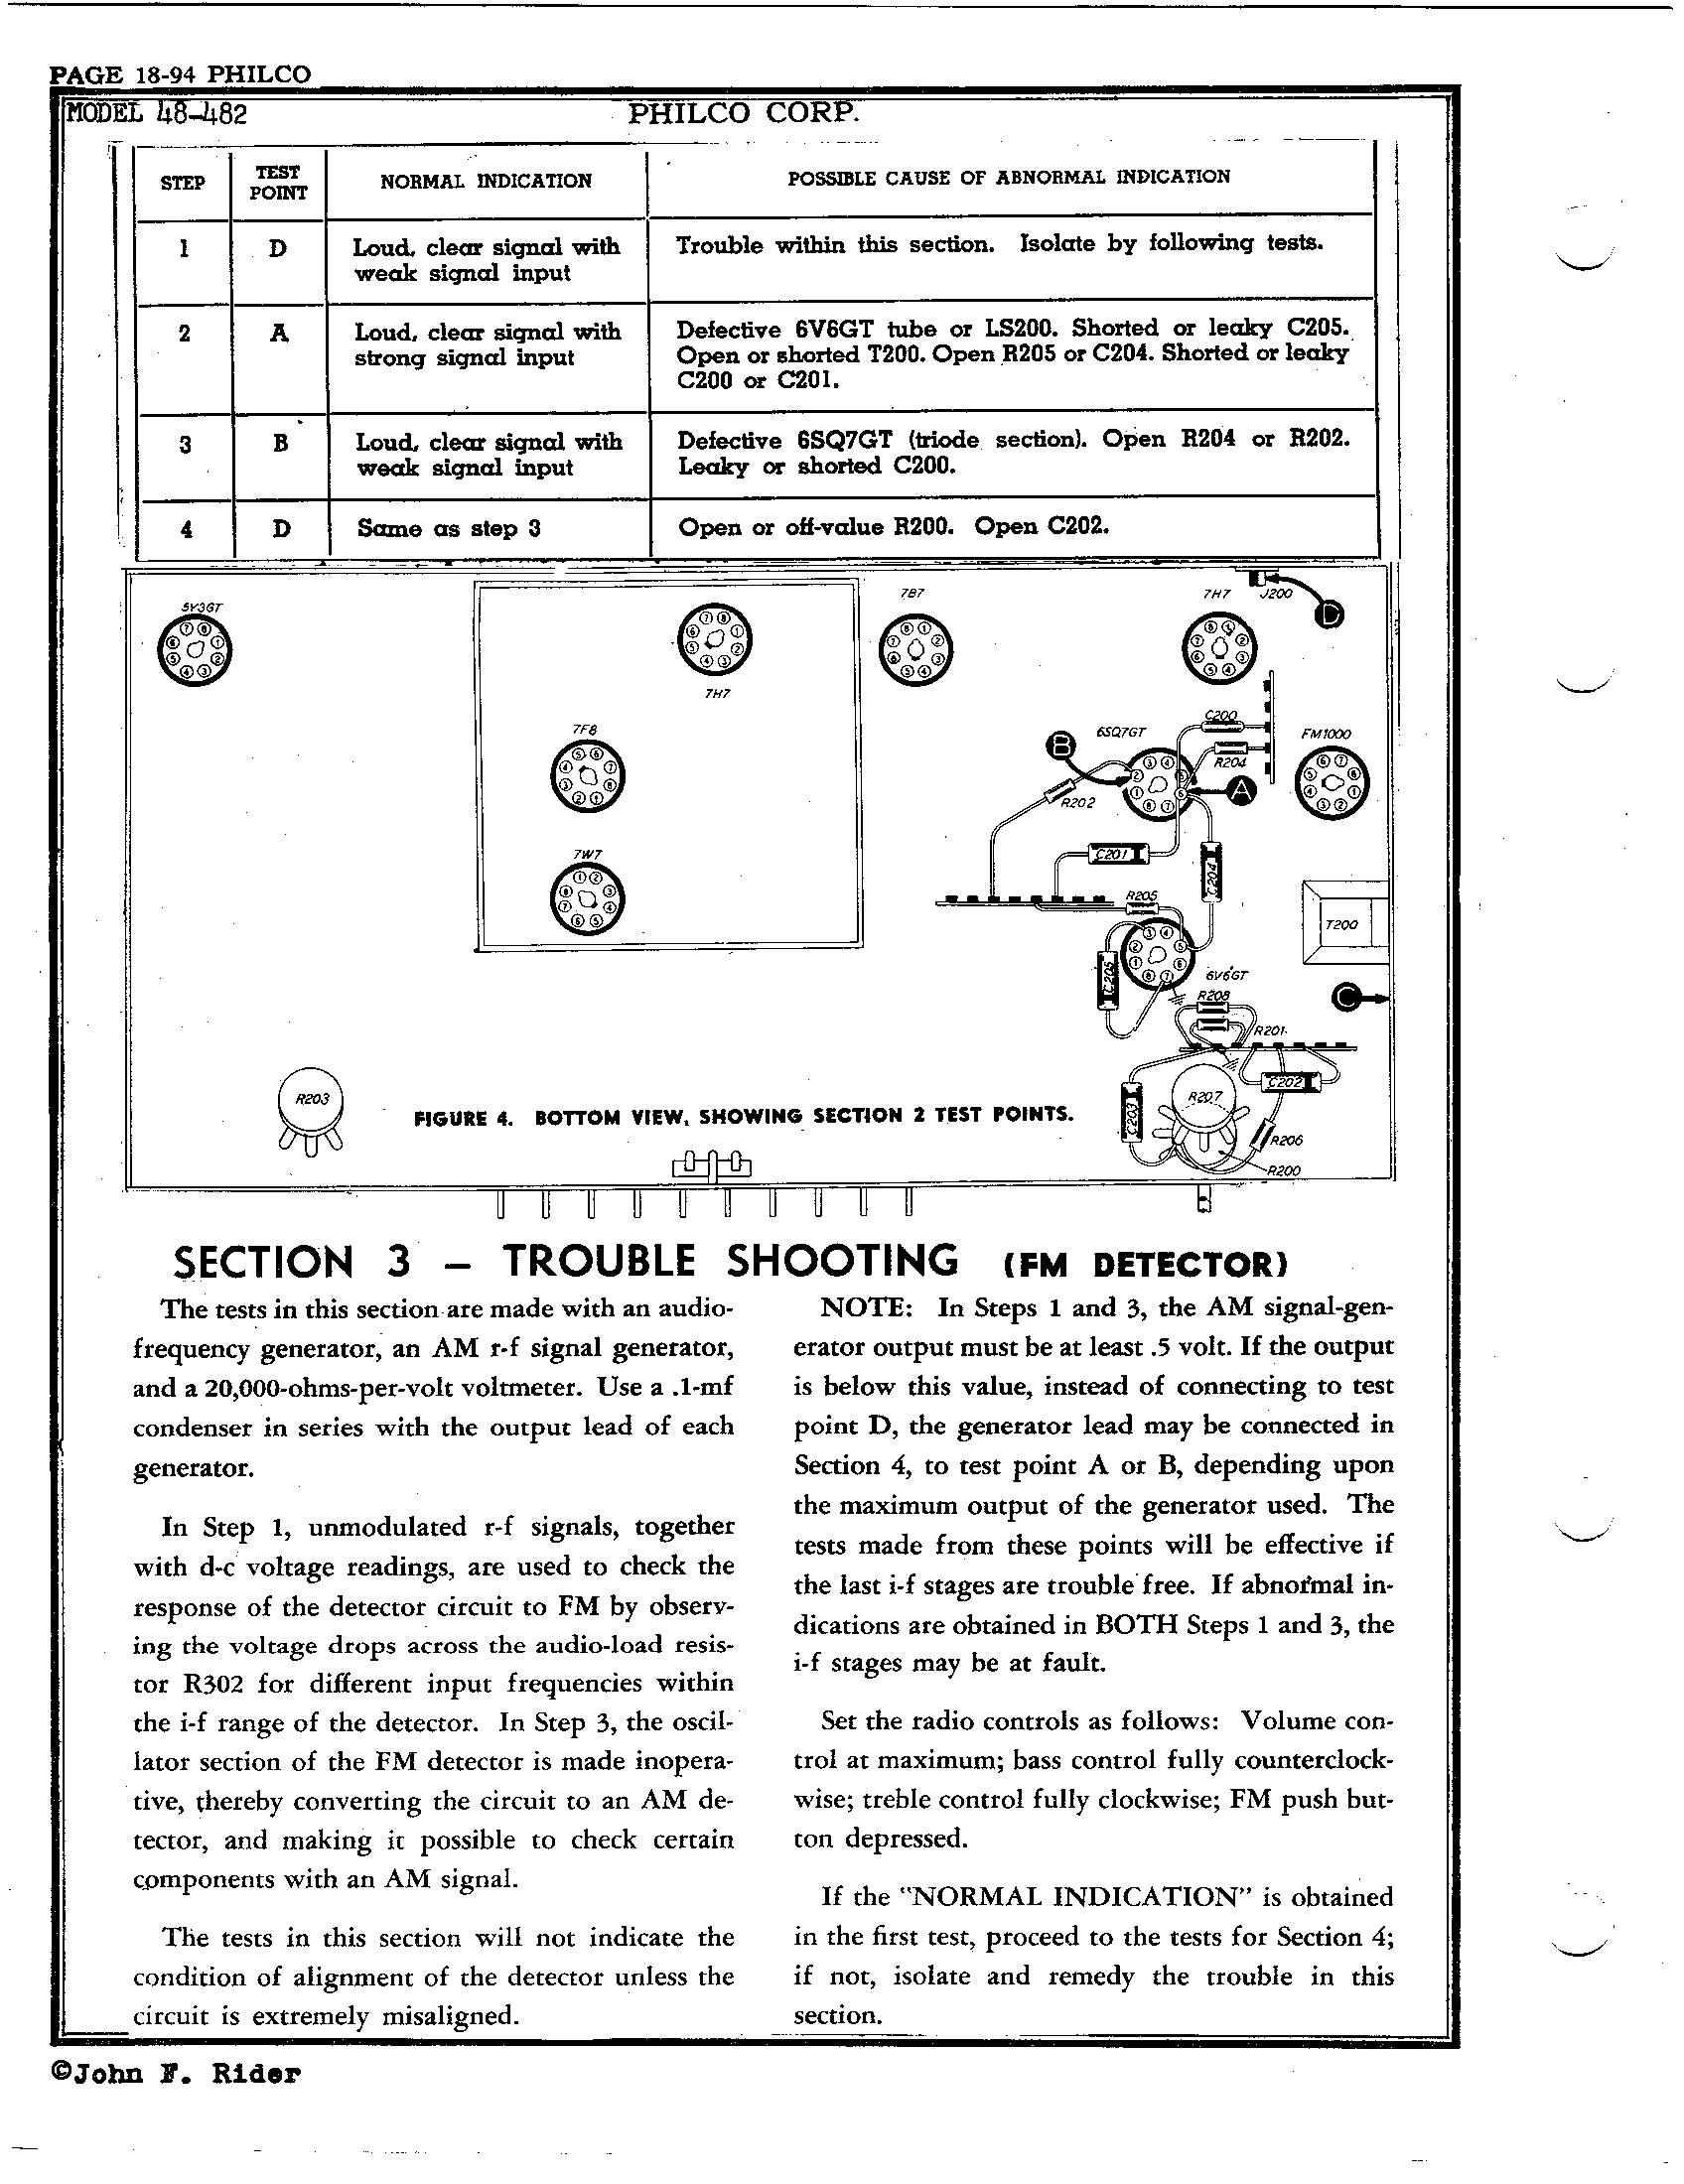 Philco Radio & Television Corp  48-482 | Antique Electronic Supply